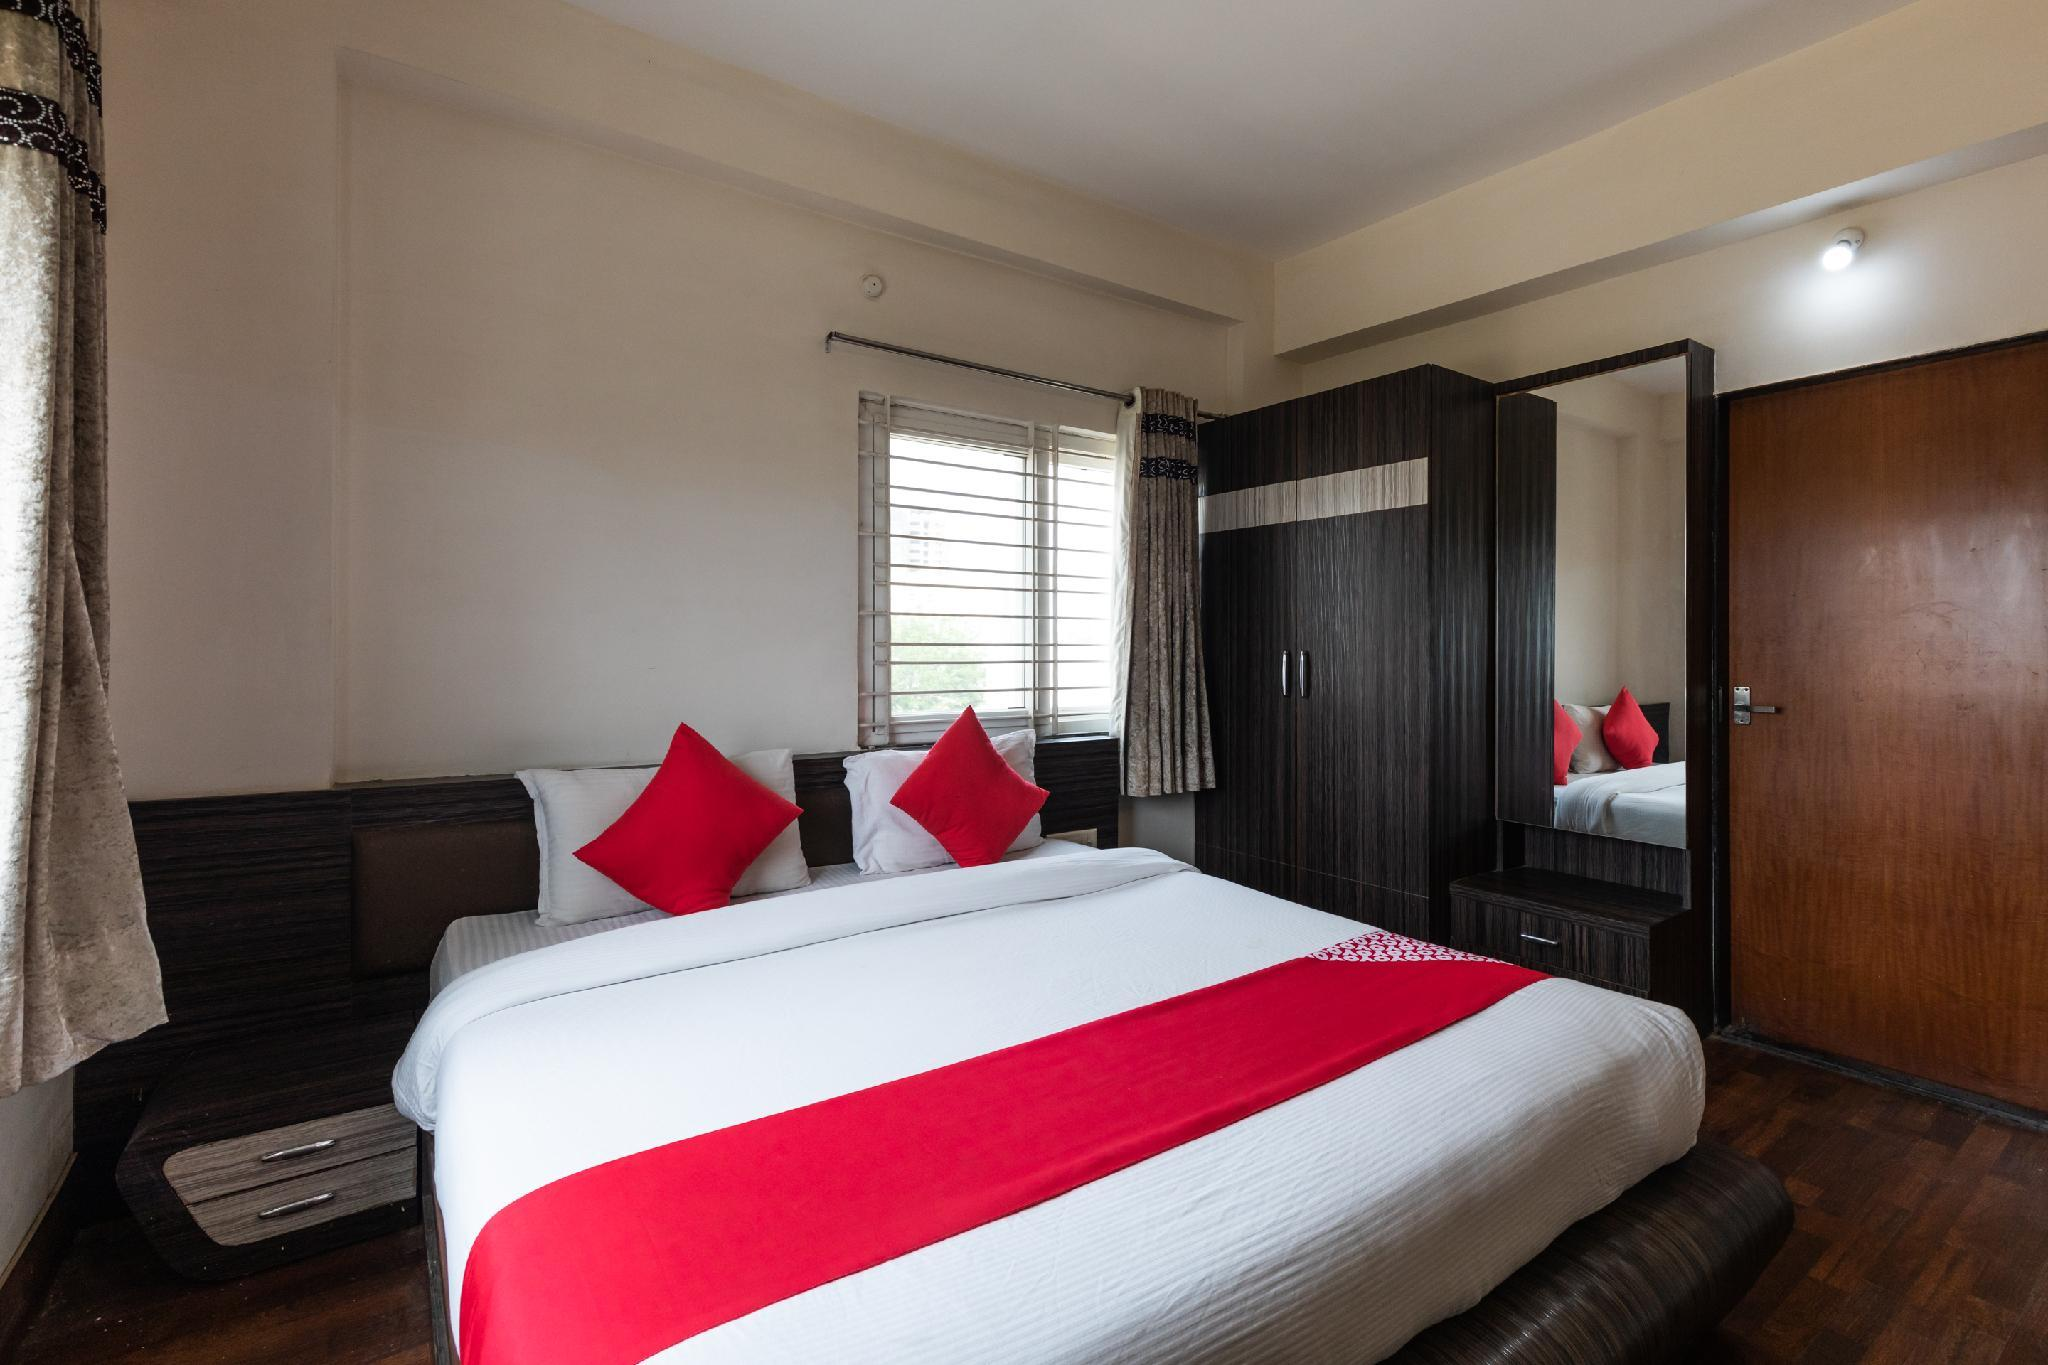 Collection O 45764 Flagship Hotel Smriti Grand